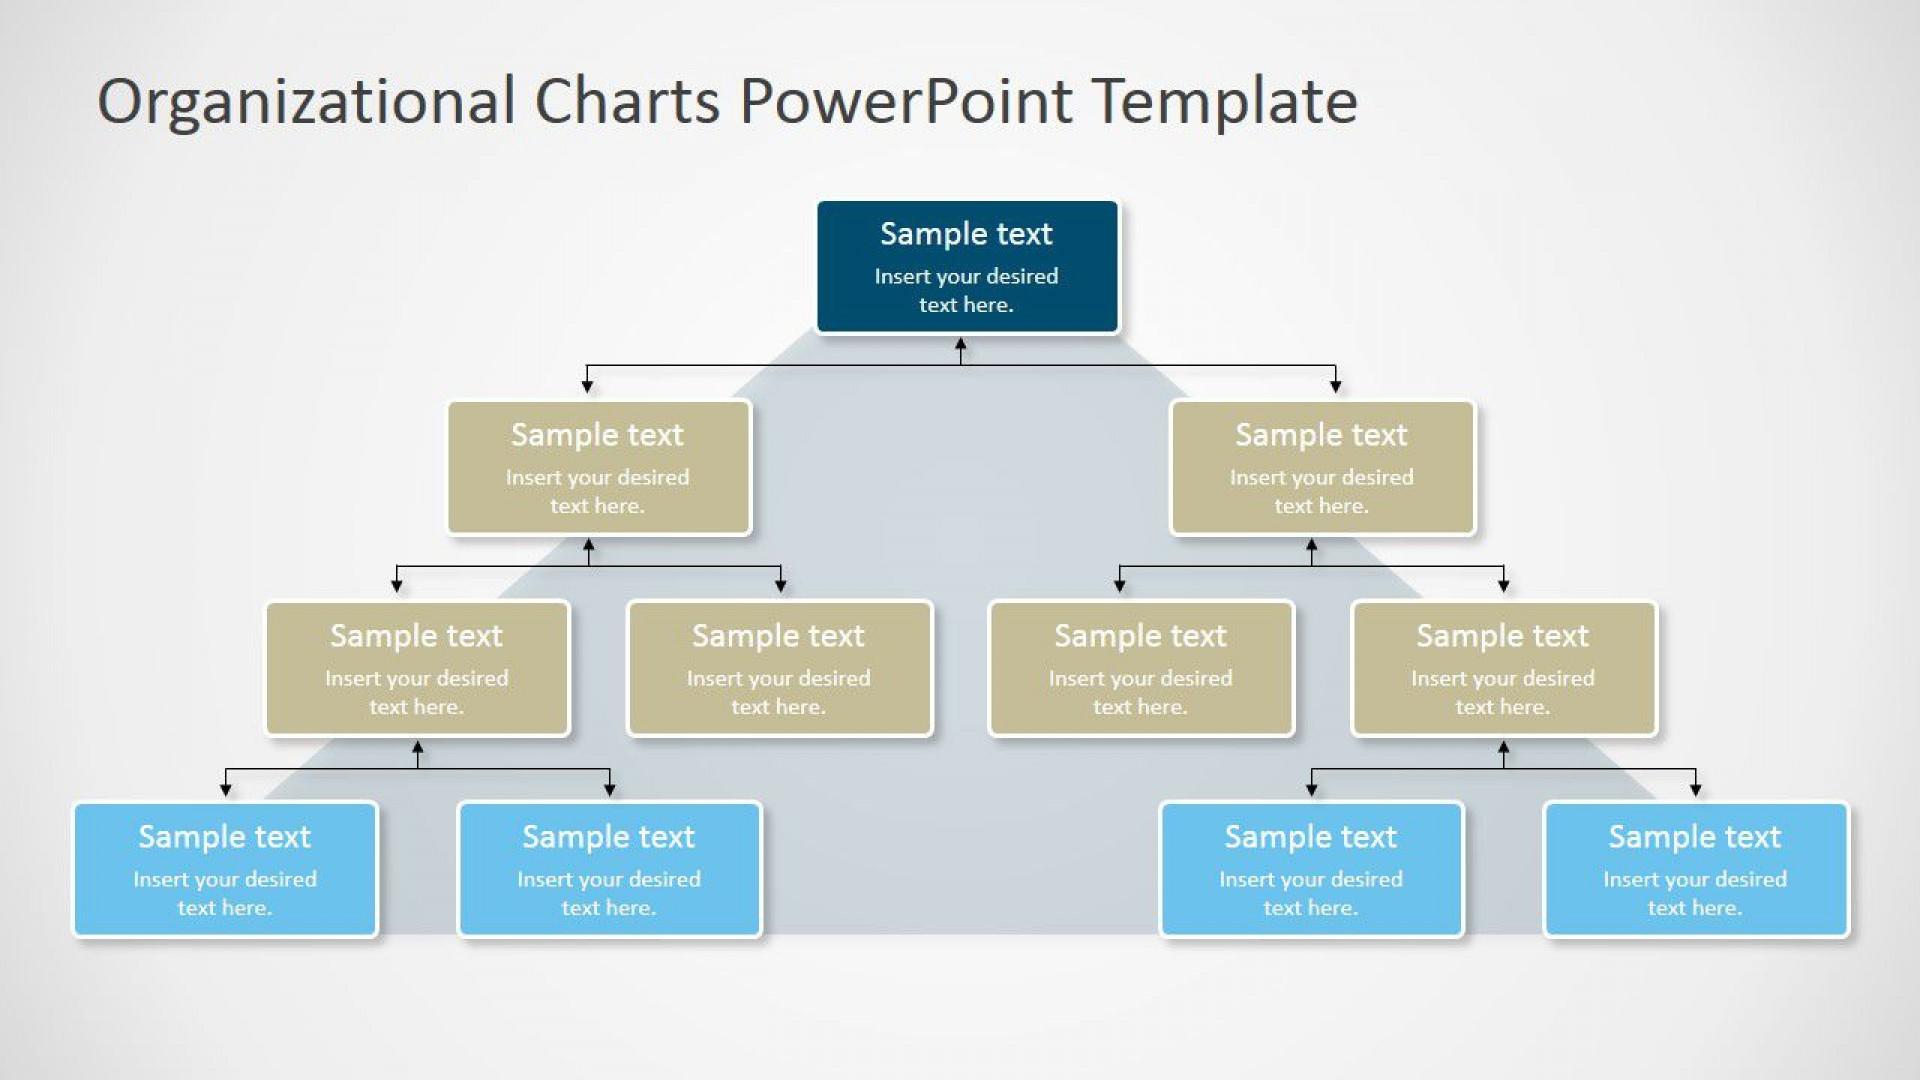 003 Breathtaking Org Chart Template Powerpoint High Resolution  Free Organization Download Organizational 20101920